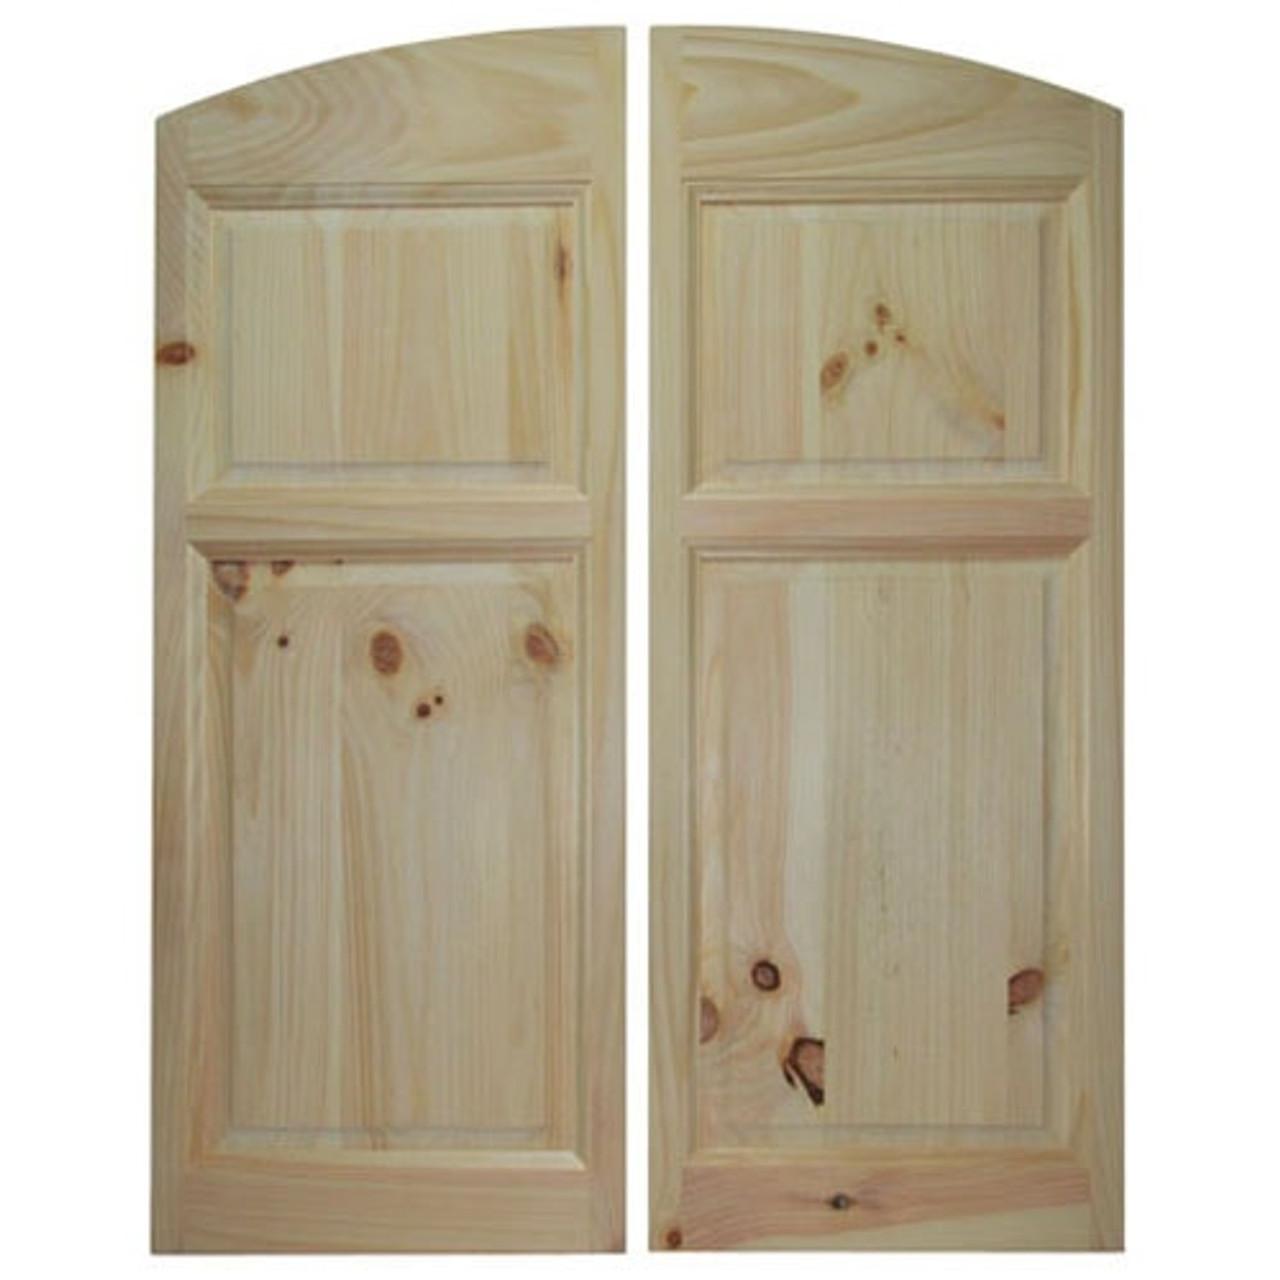 Archway Style Saloon Doors | Cafe Doors